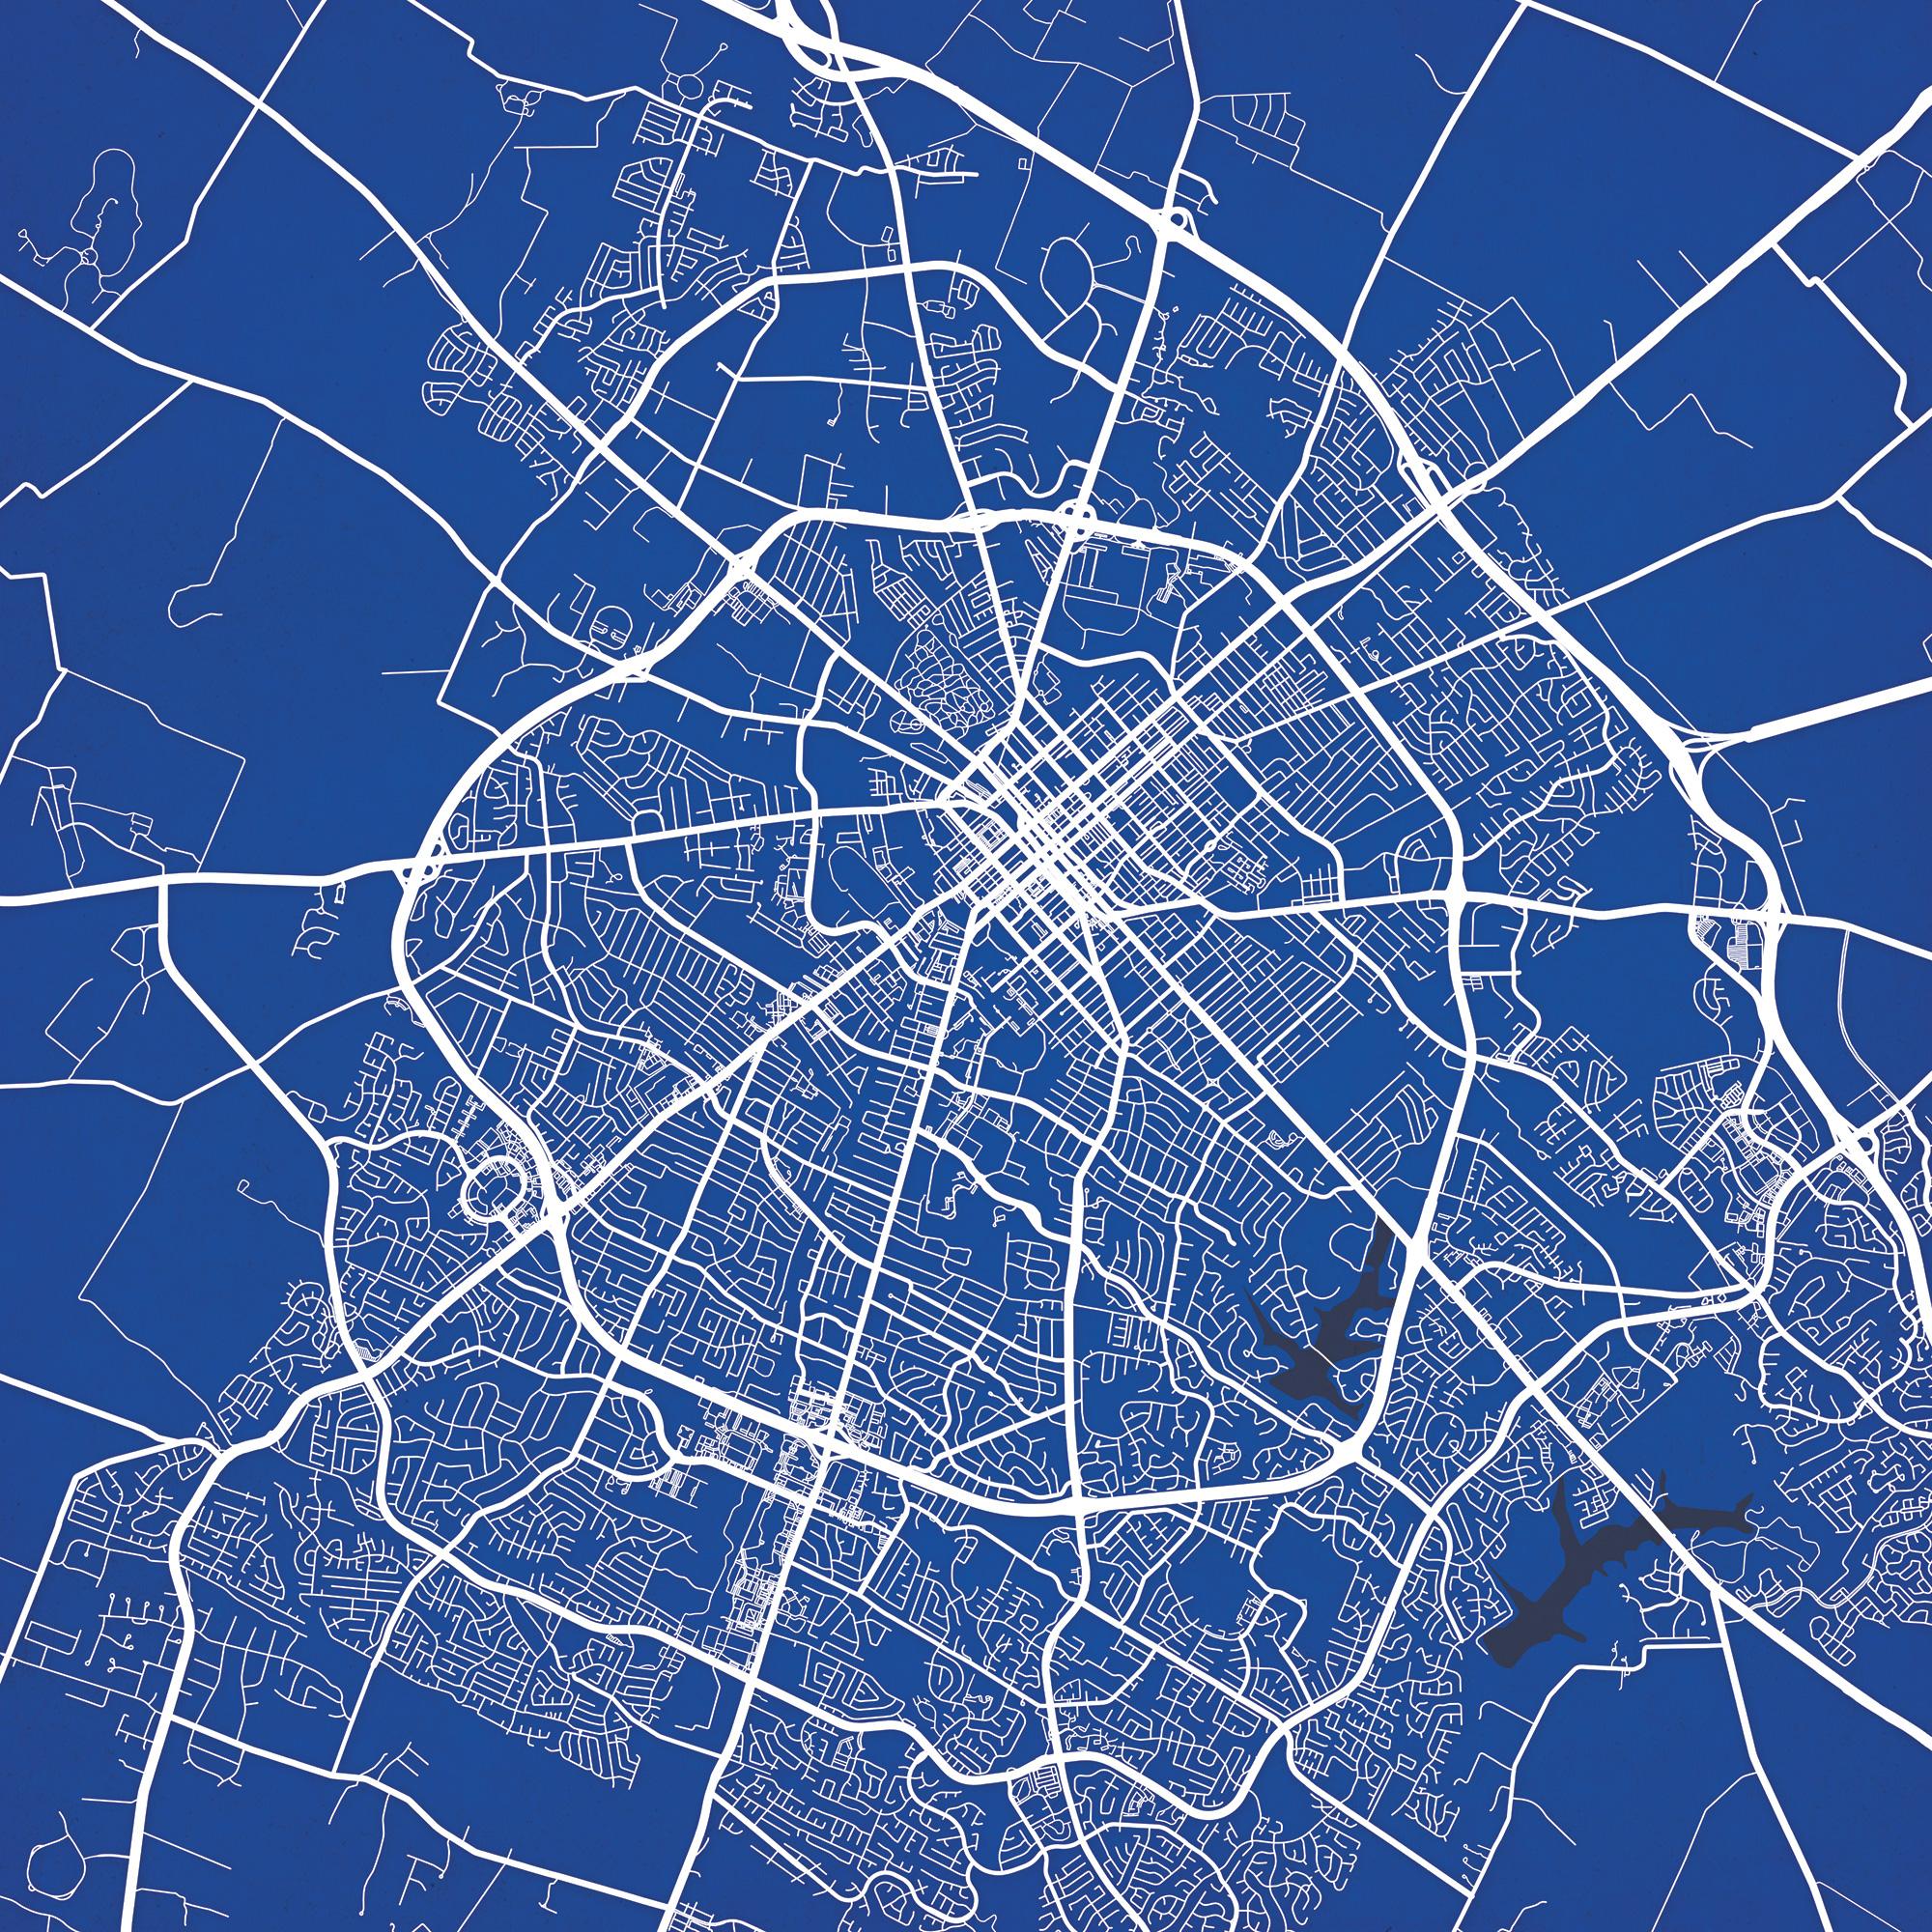 Lexington, Kentucky Map Art on s carolina city map, tennessee city map, pontotoc city map, washington d.c. city map, rockingham county city map, bonita city map, lawrenceburg city map, kentucky ashland ky, georgia city map, massachusetts city map, johnson county city map, pikeville city map, bay st. louis city map, levy county city map, alvin city map, new roads city map, indiana city map, louisiana city map, park city city map, western north carolina city map,